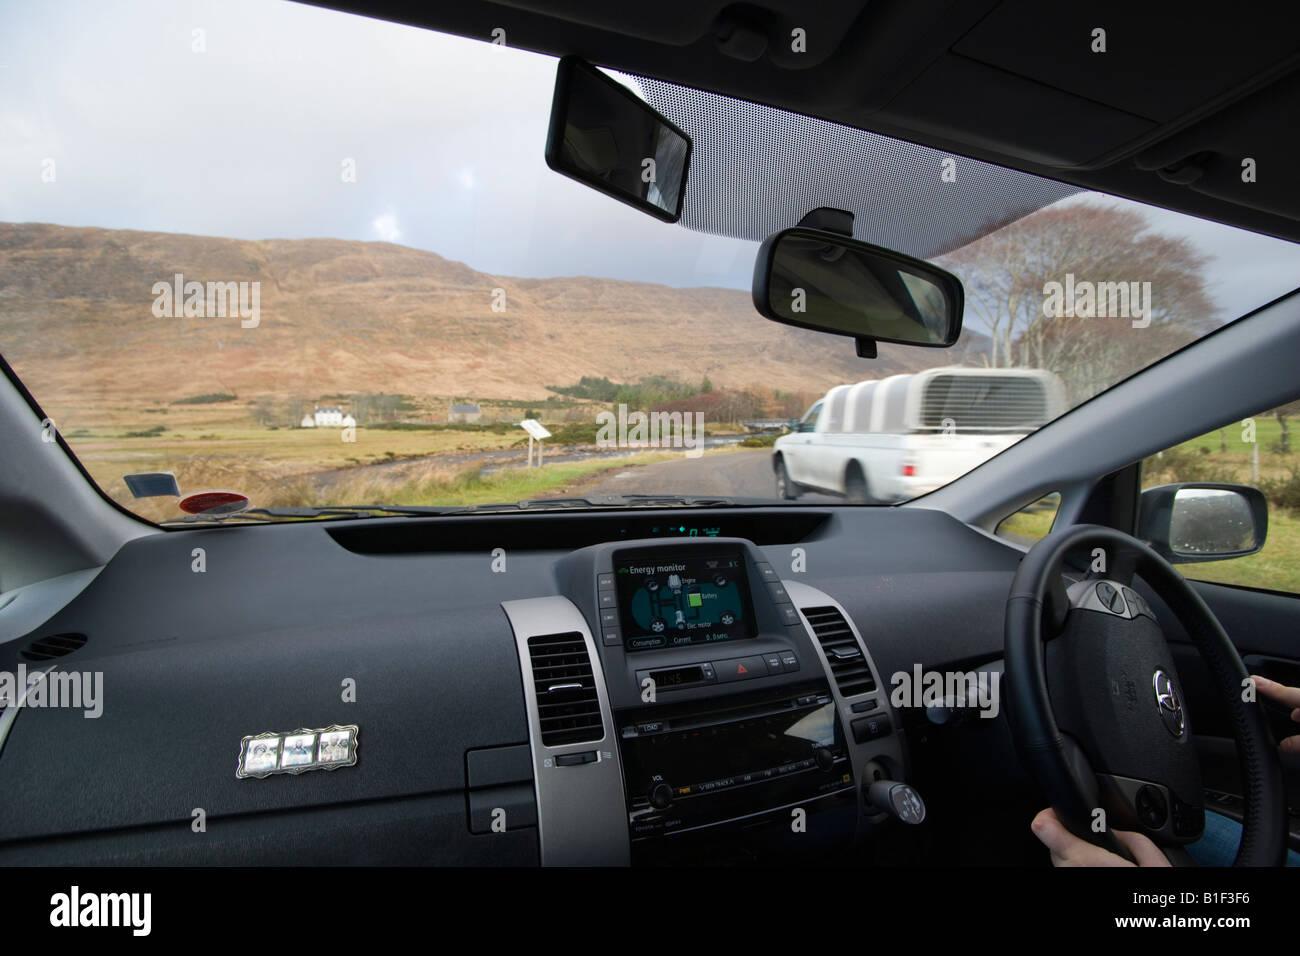 https://c8.alamy.com/comp/B1F3F6/toyota-prius-interior-driving-in-highlands-scotland-uk-B1F3F6.jpg